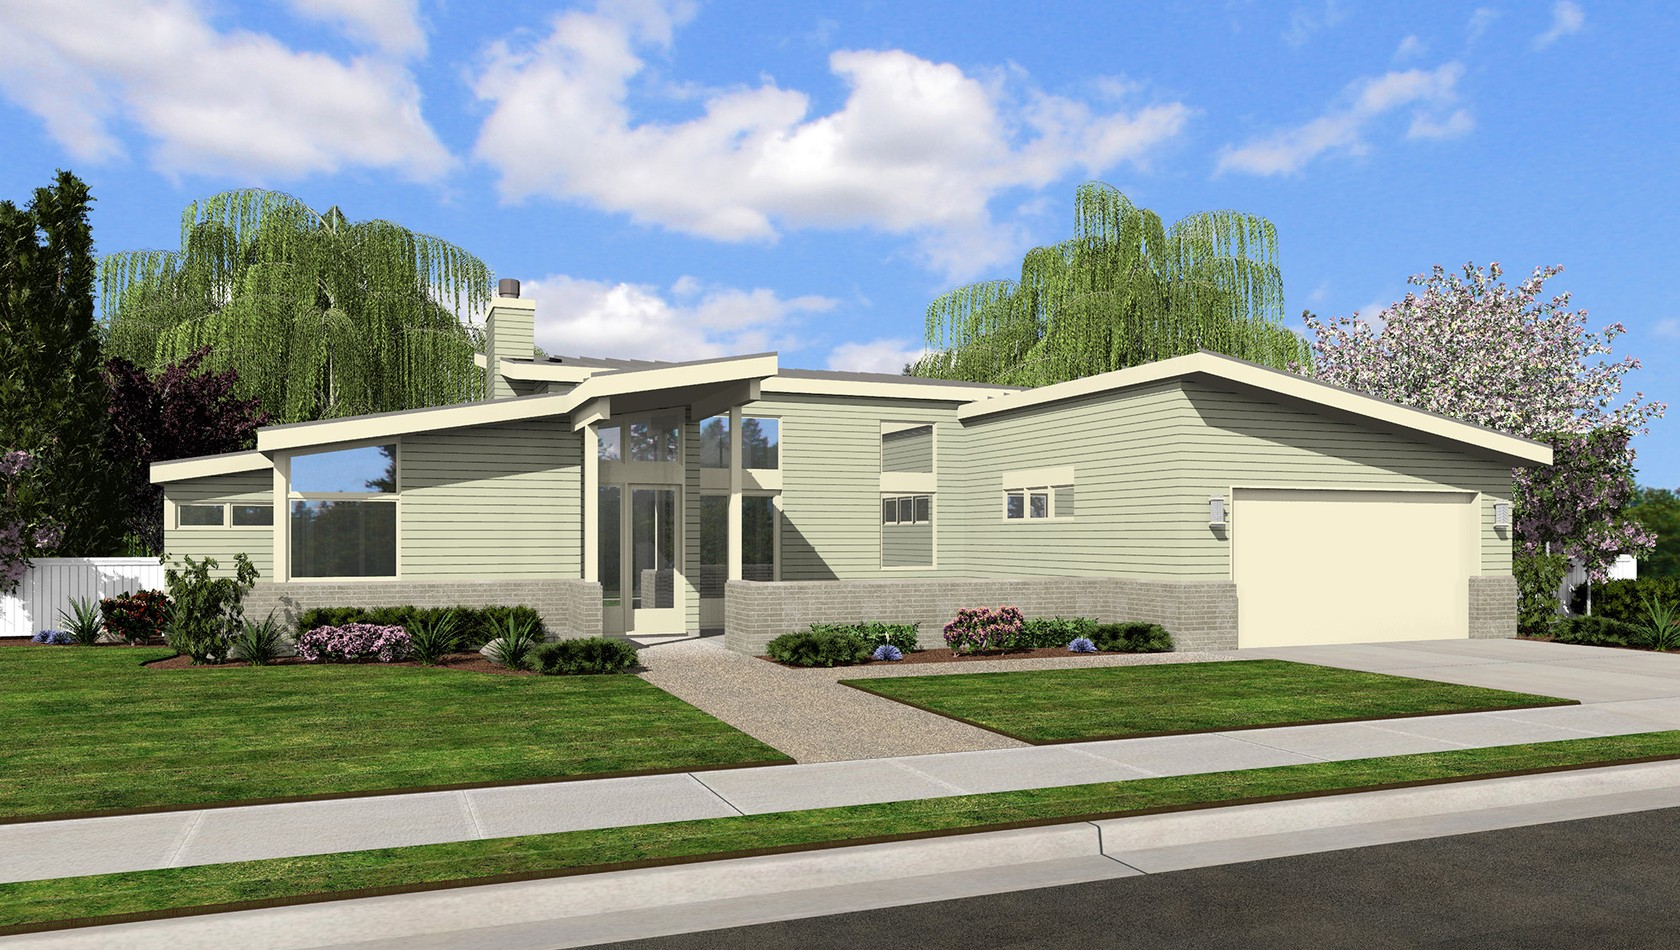 Mascord House Plan 1163: The Westside